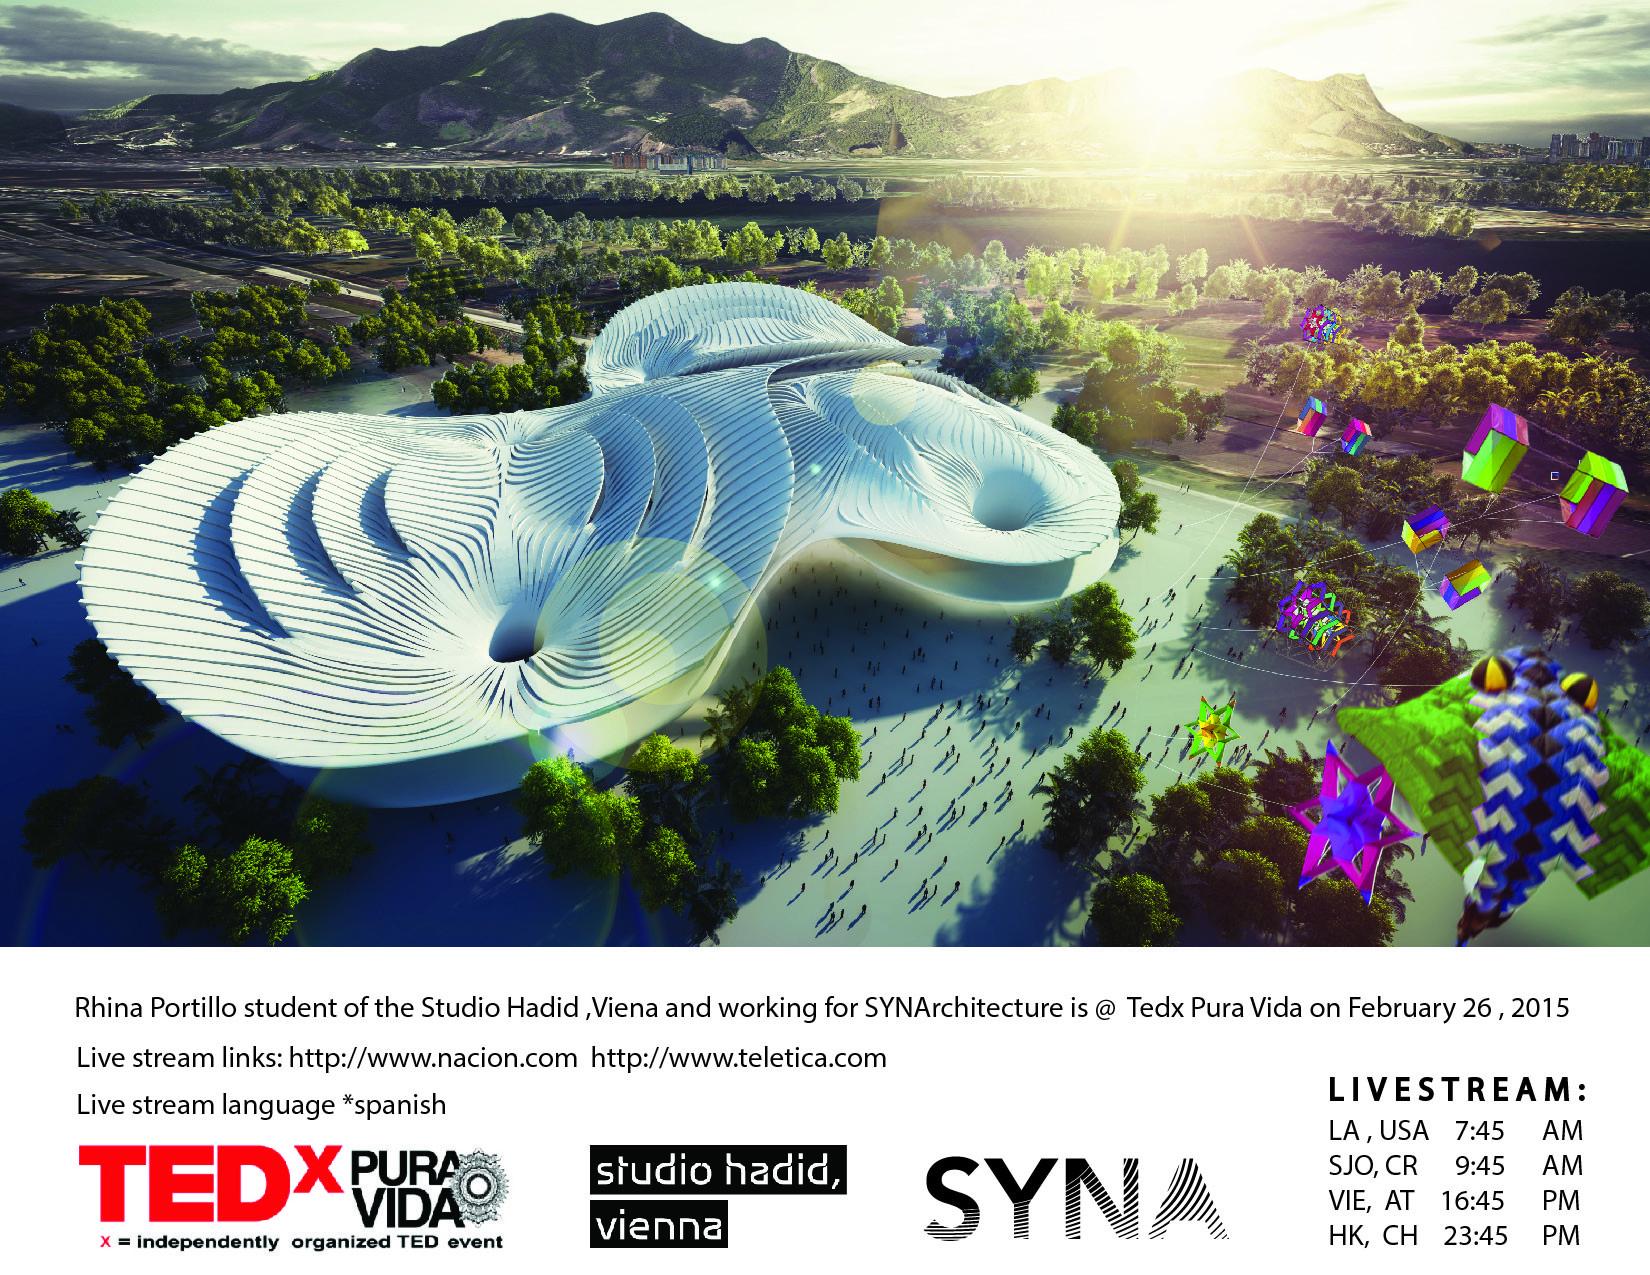 Conferencia online Tedx Pura Vida: Rhina Portillo